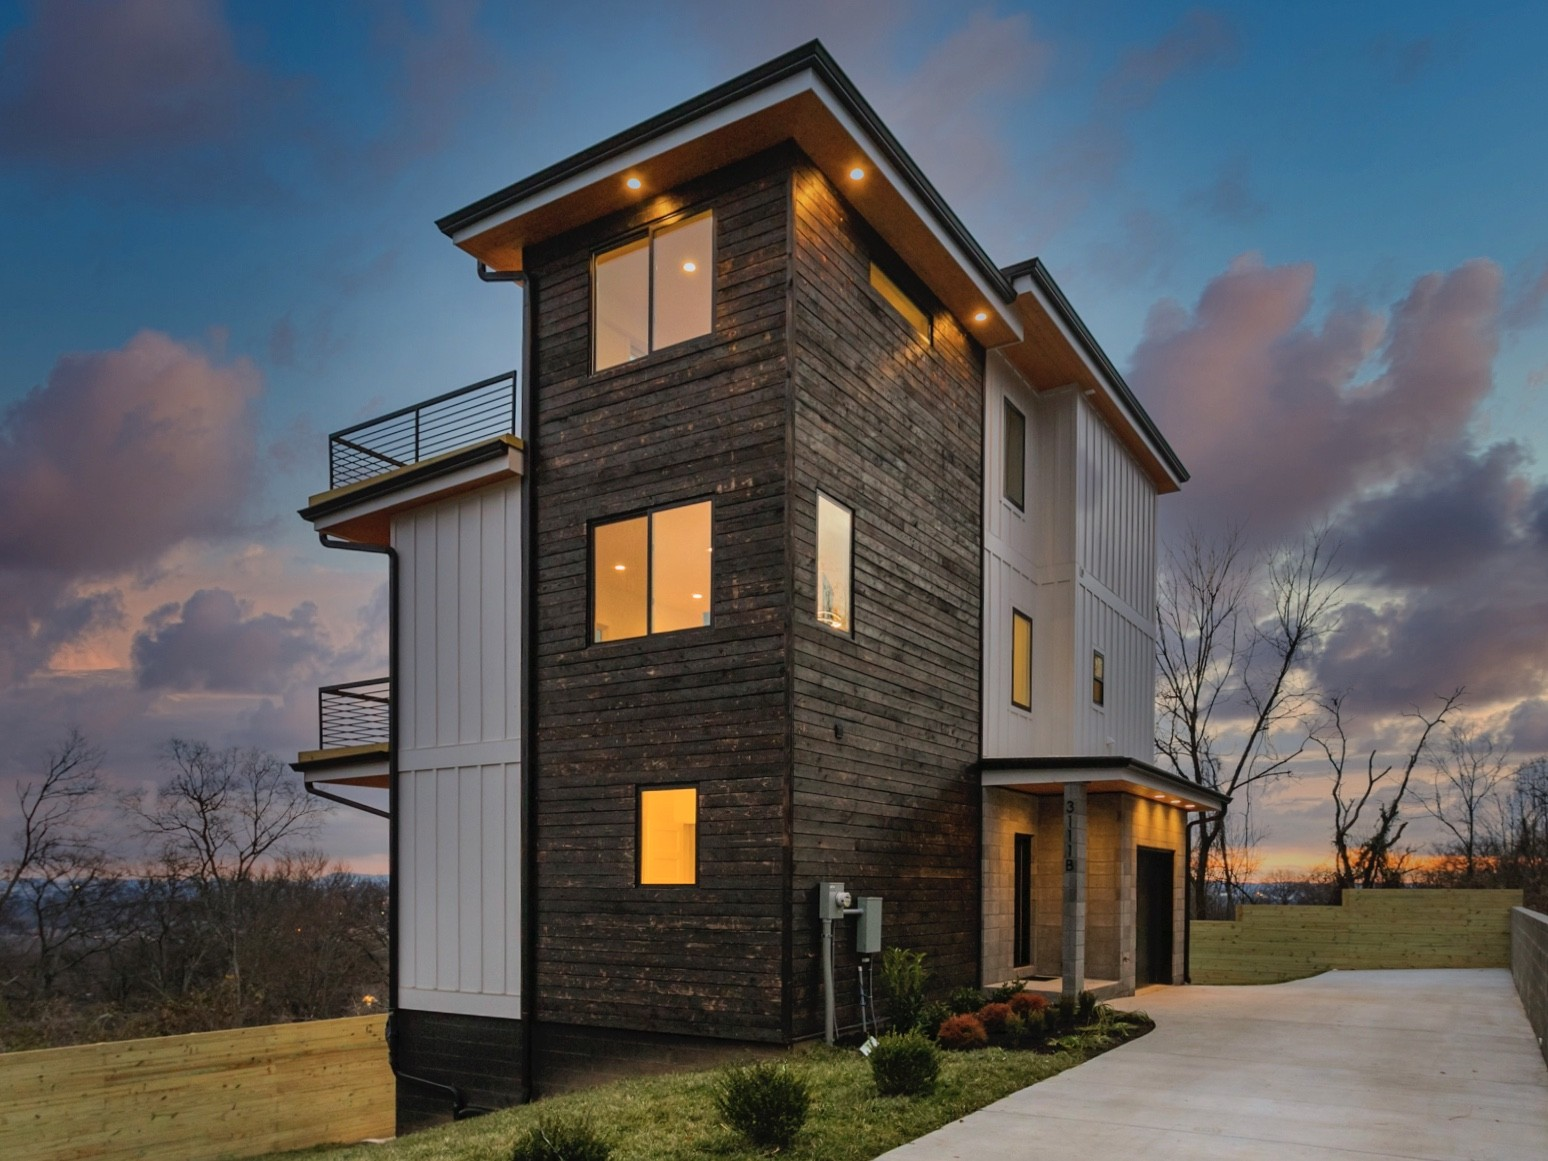 3111B Cliff Dr, Nashville, TN 37218 - Nashville, TN real estate listing